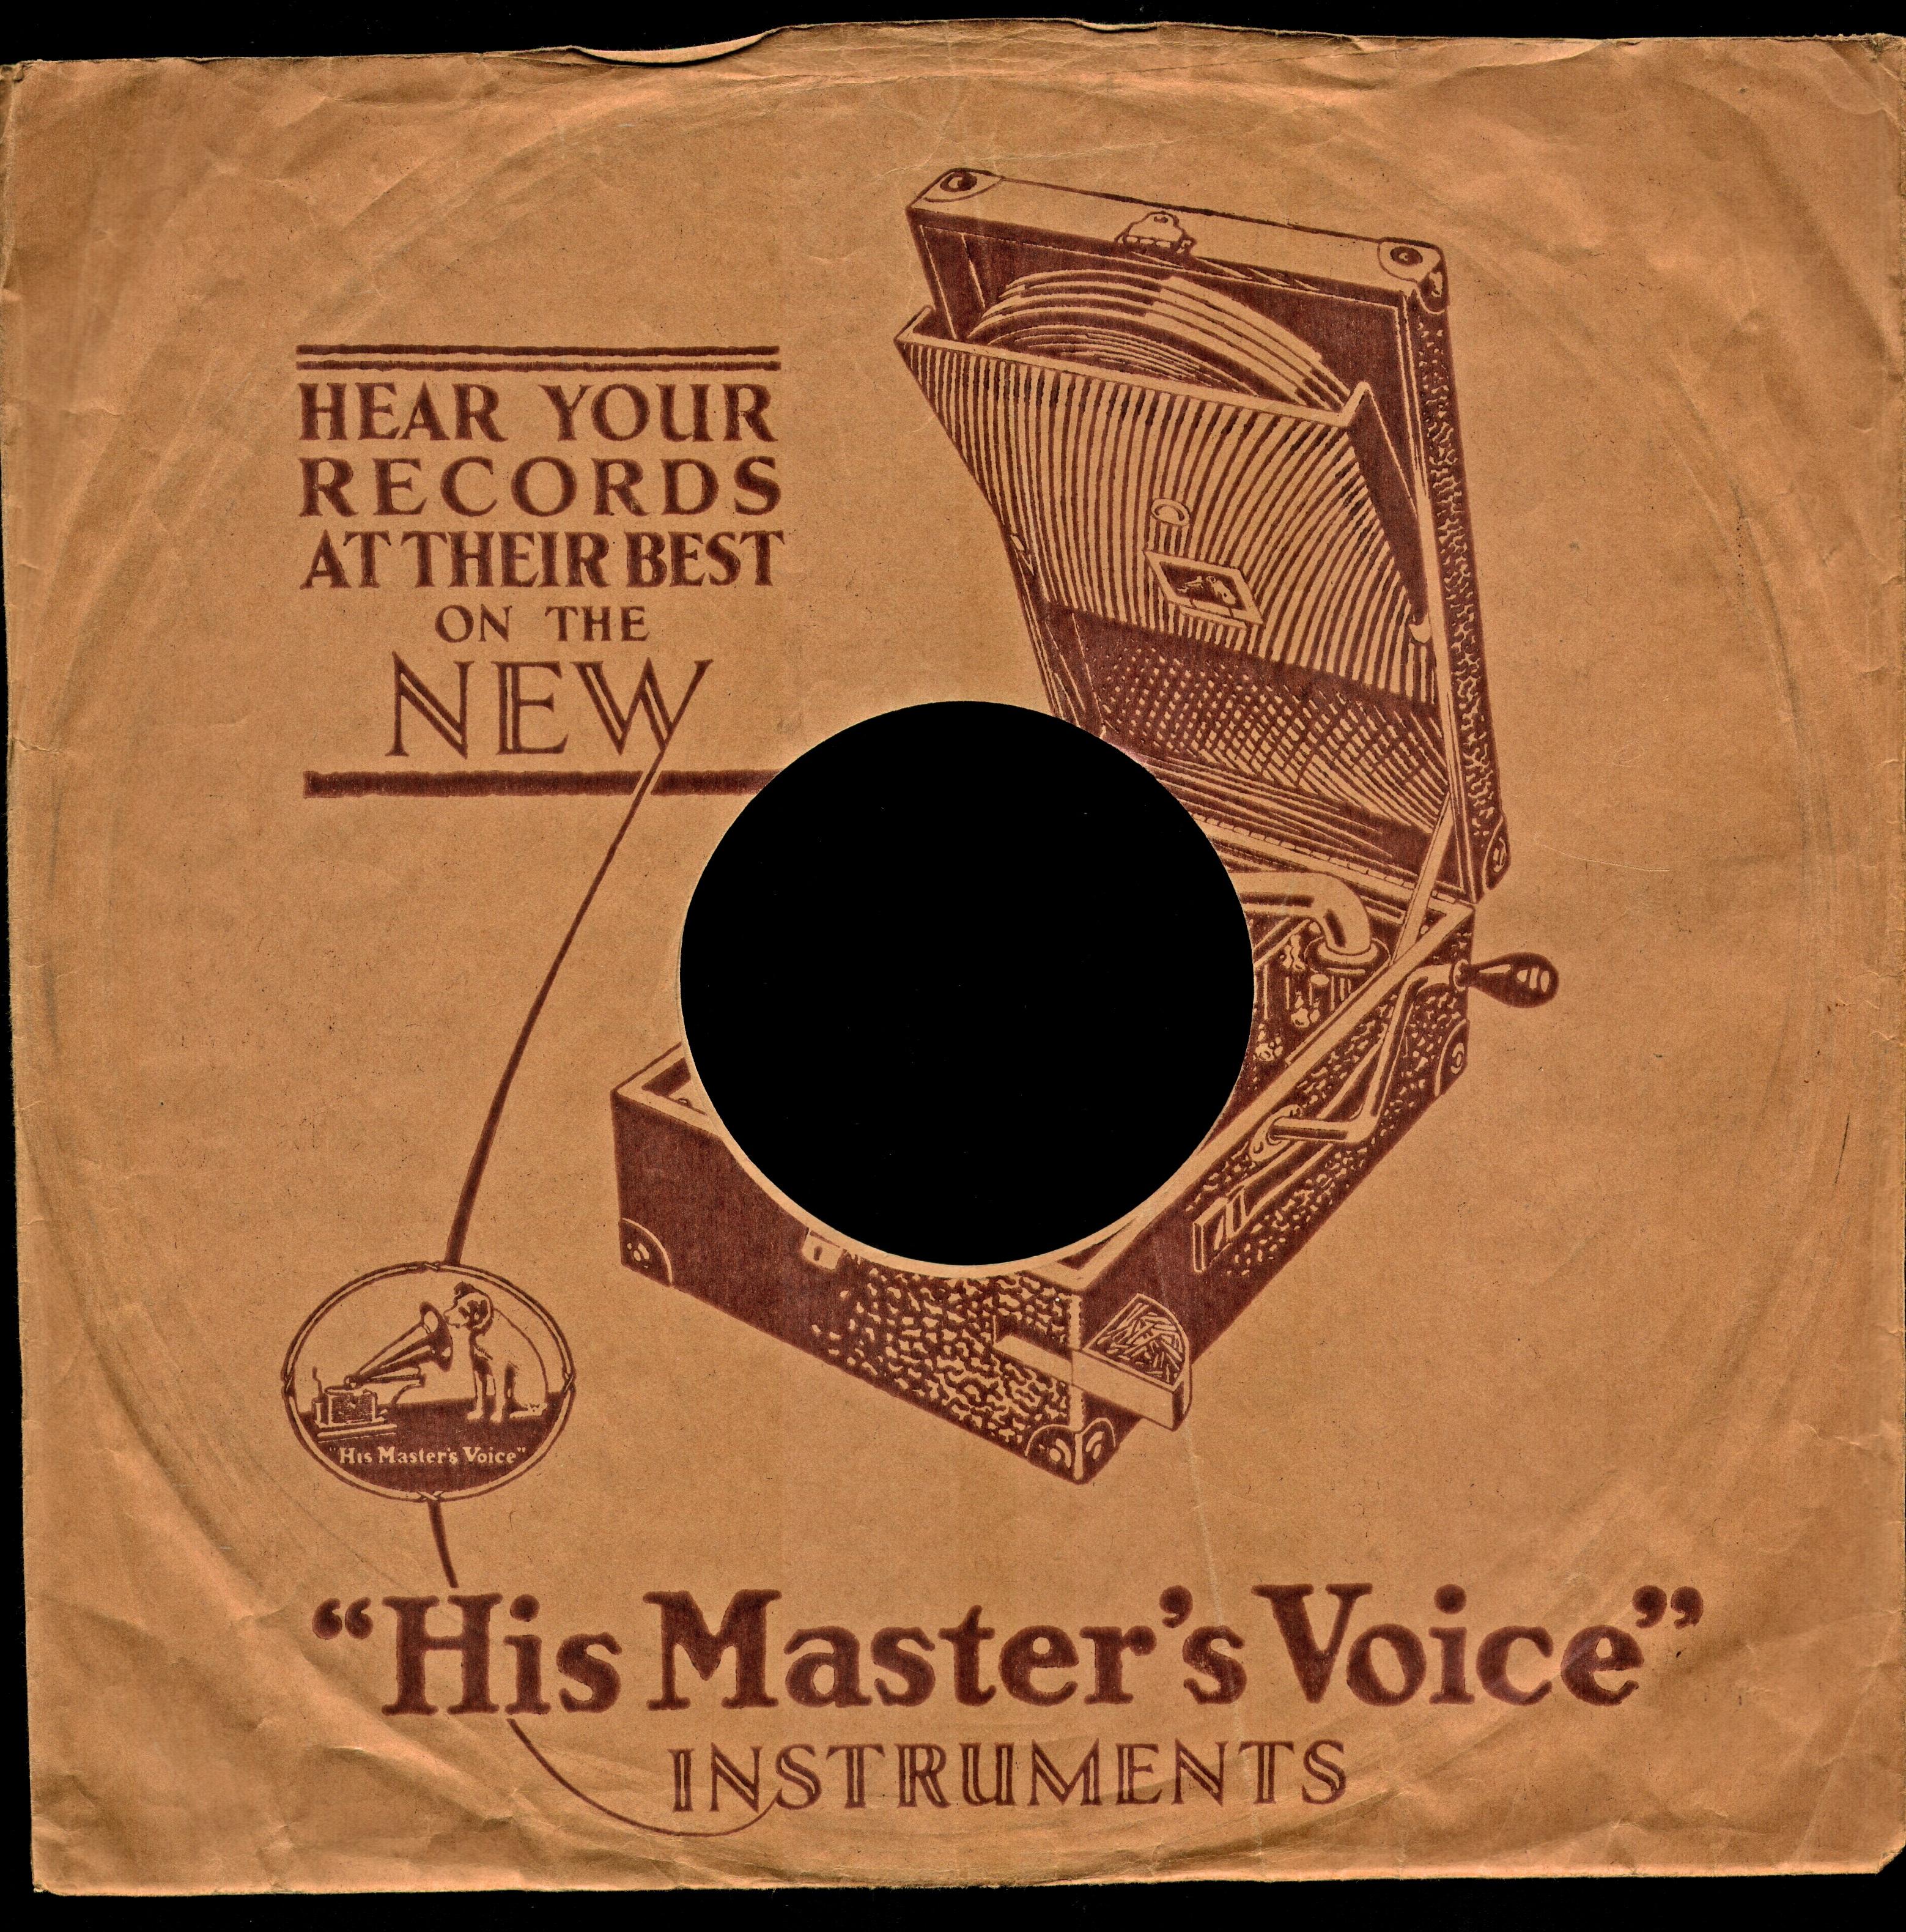 Free Images : record, wood, vintage, analog, pattern, nostalgia